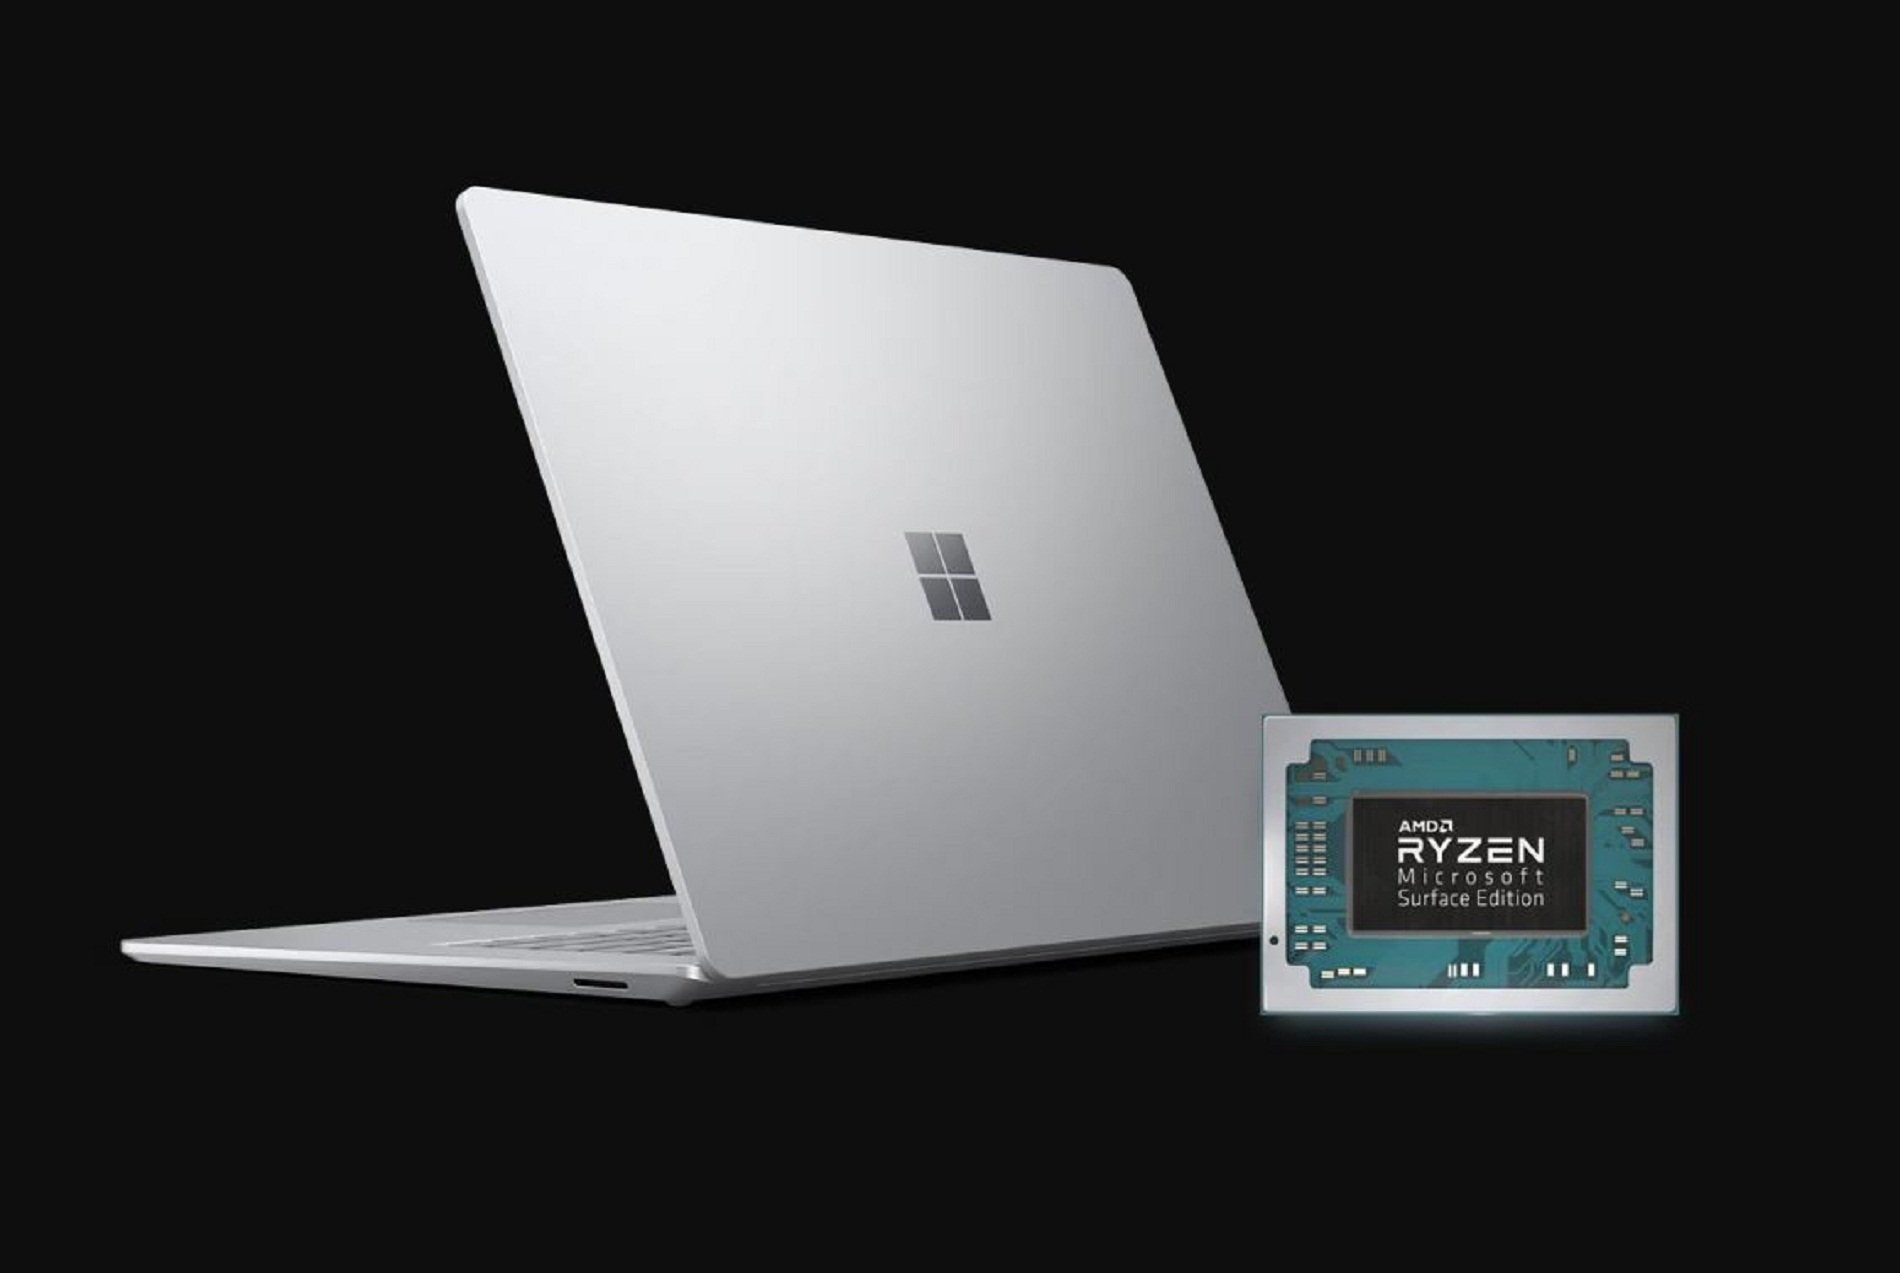 New Microsoft Surface Notebook Identified Using Amd Ryzen Zen Cpu And Navi Radeon Rx Gpu Amd Amdradeonrx Cpus In 2020 Microsoft Surface Microsoft Surface Laptop